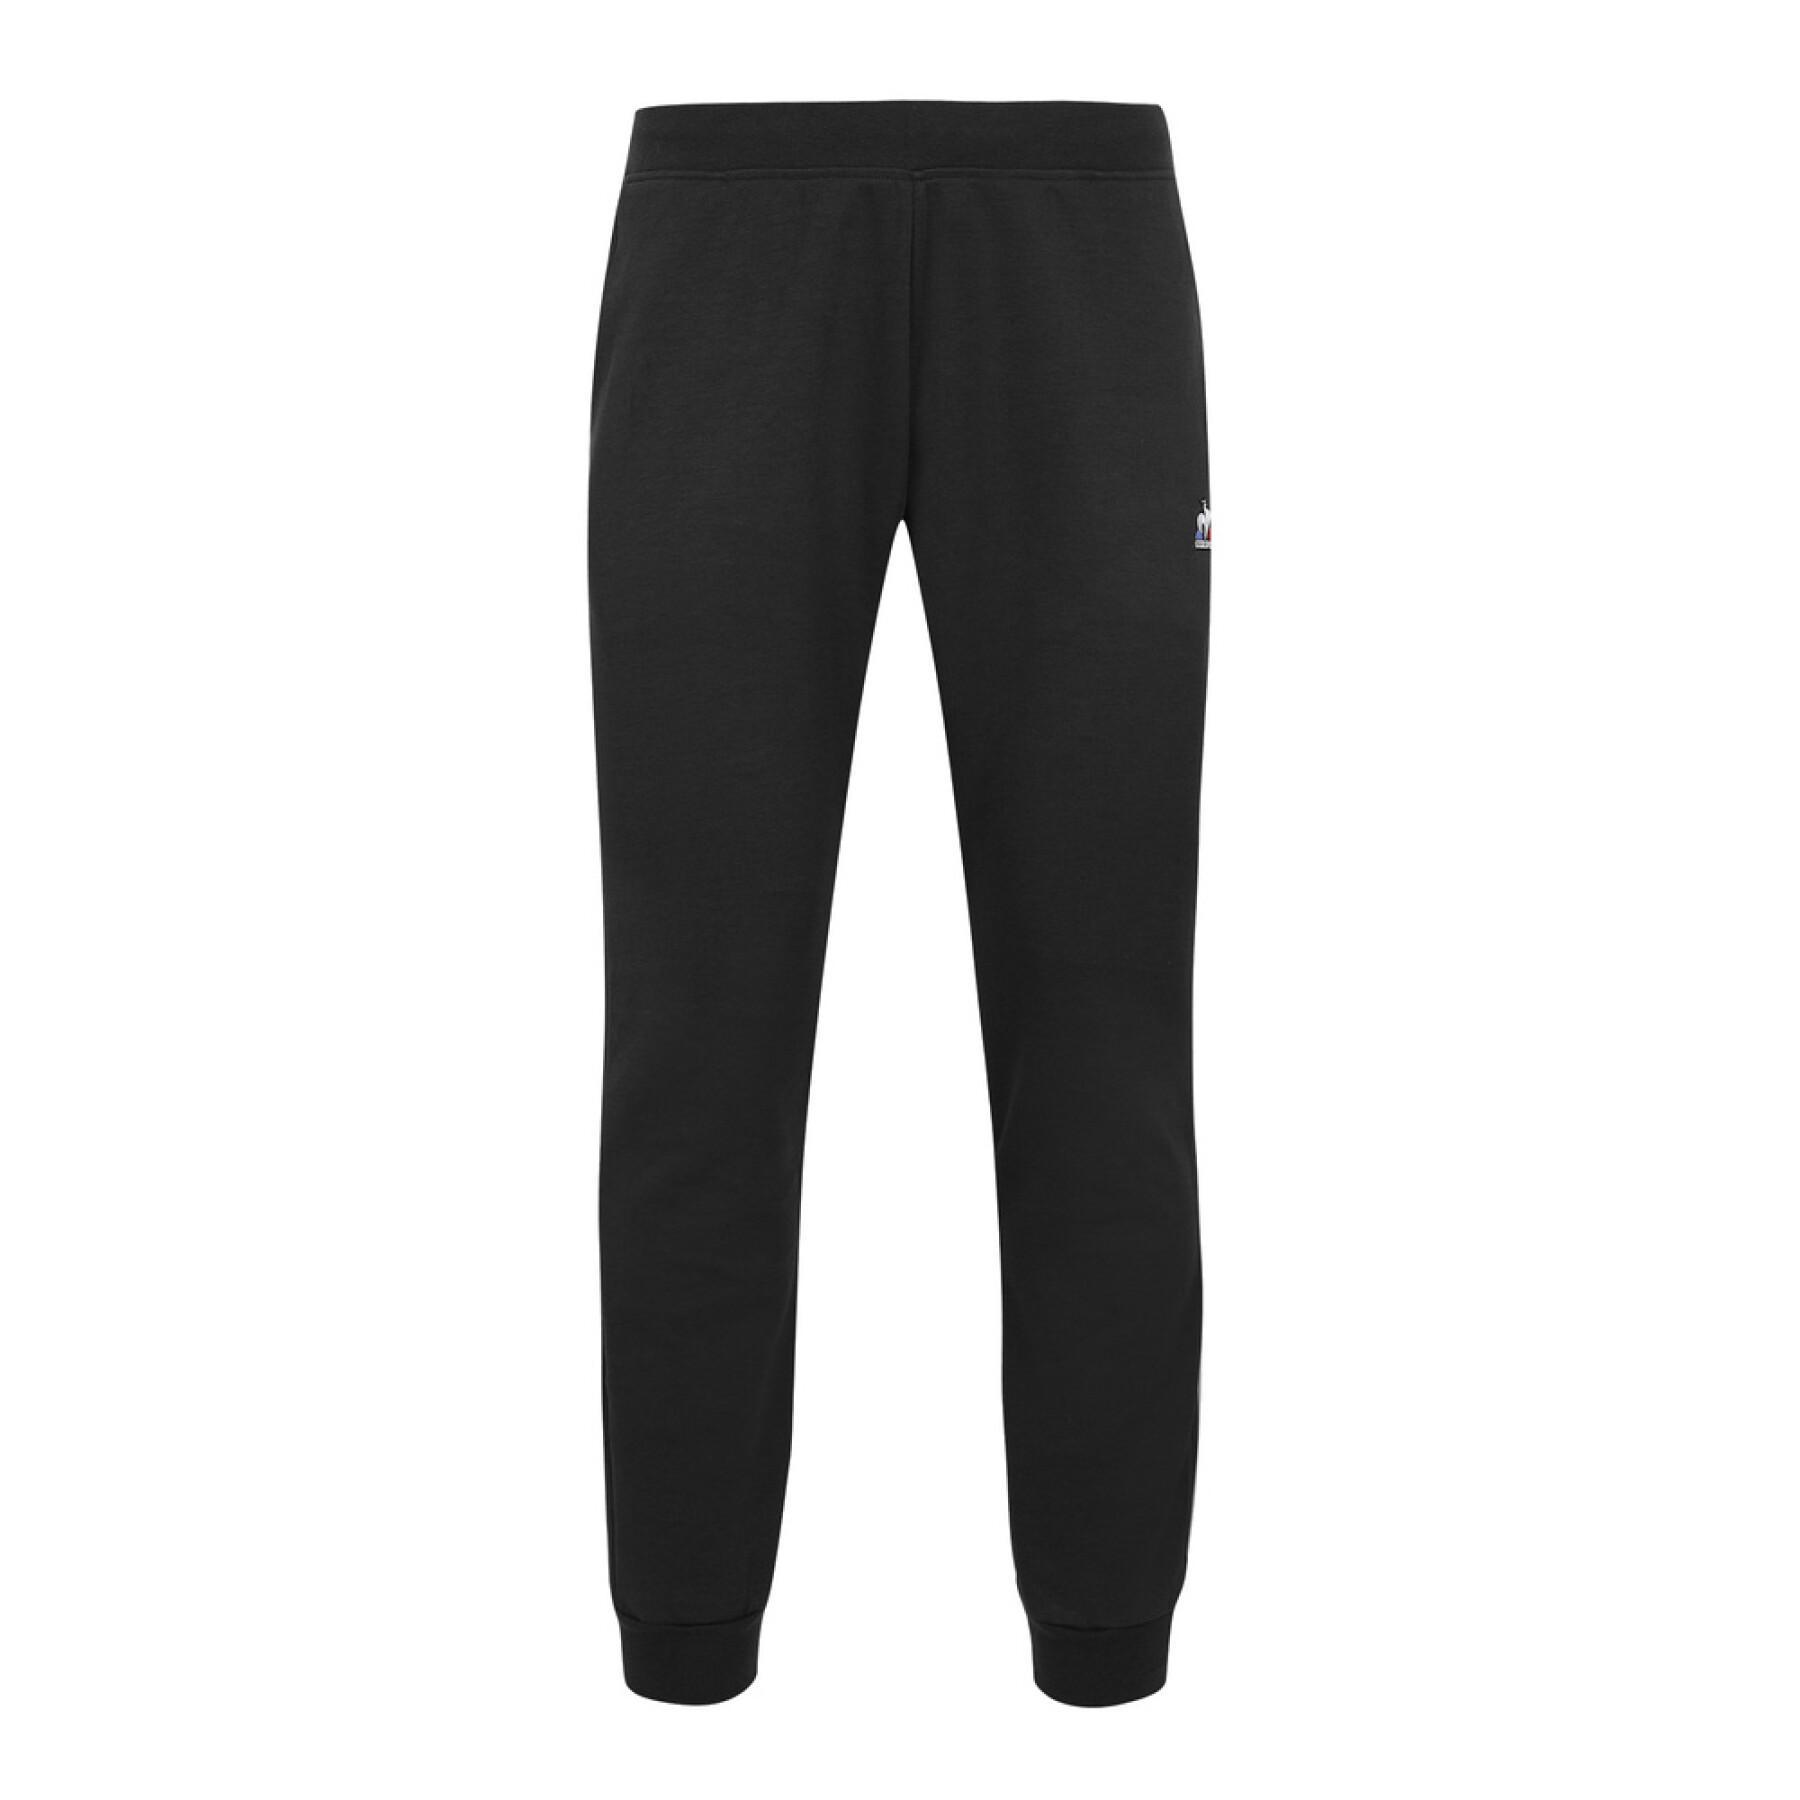 Jogging pants Le Coq Sportif Essentiels